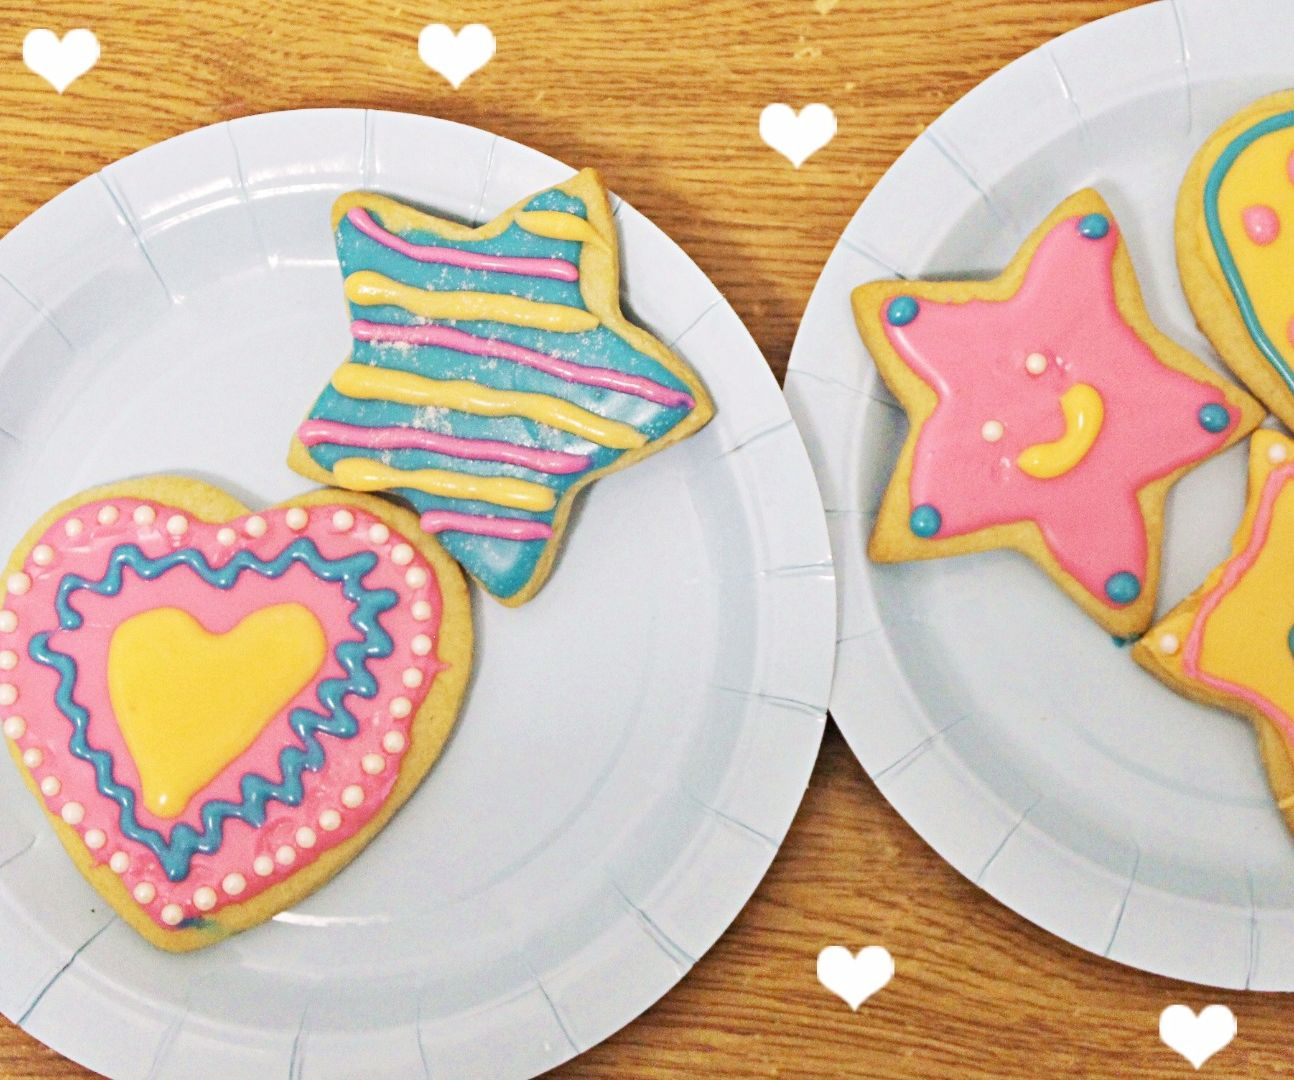 Super Cute Tea Cake Cookies!